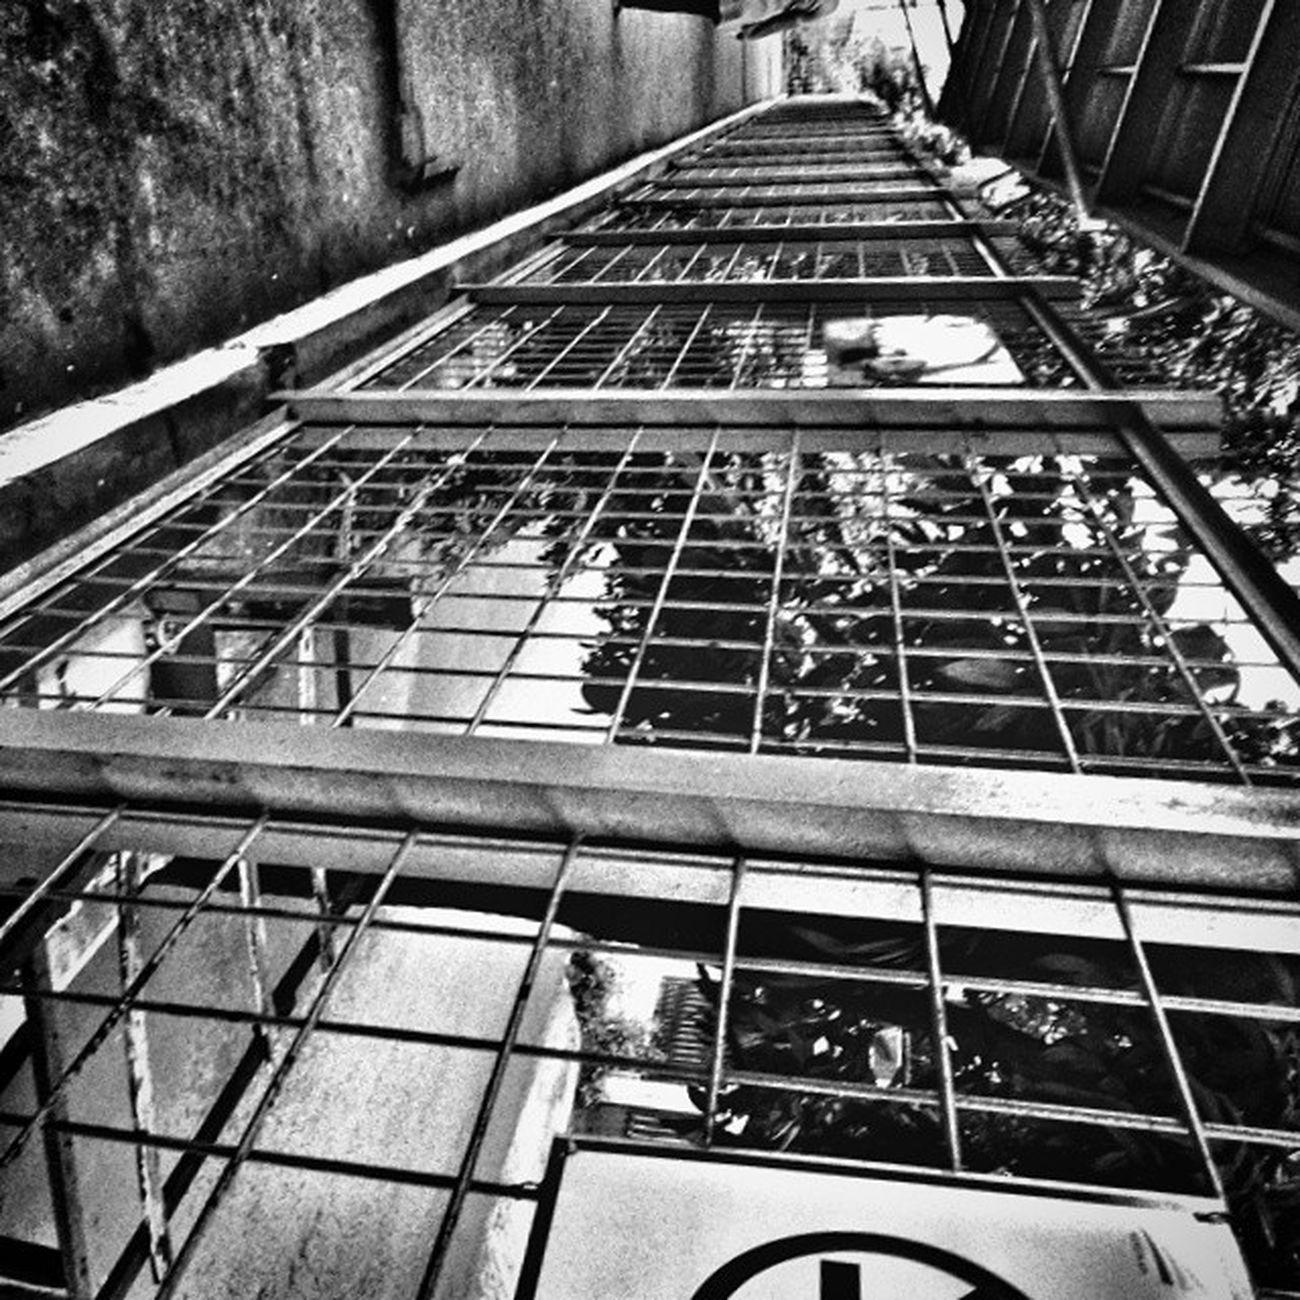 Pagar Jakarta @AcerID @FotoDroids @KoFiPon E3xploreMDK Fotodroids Pagar Jakarta noir unique